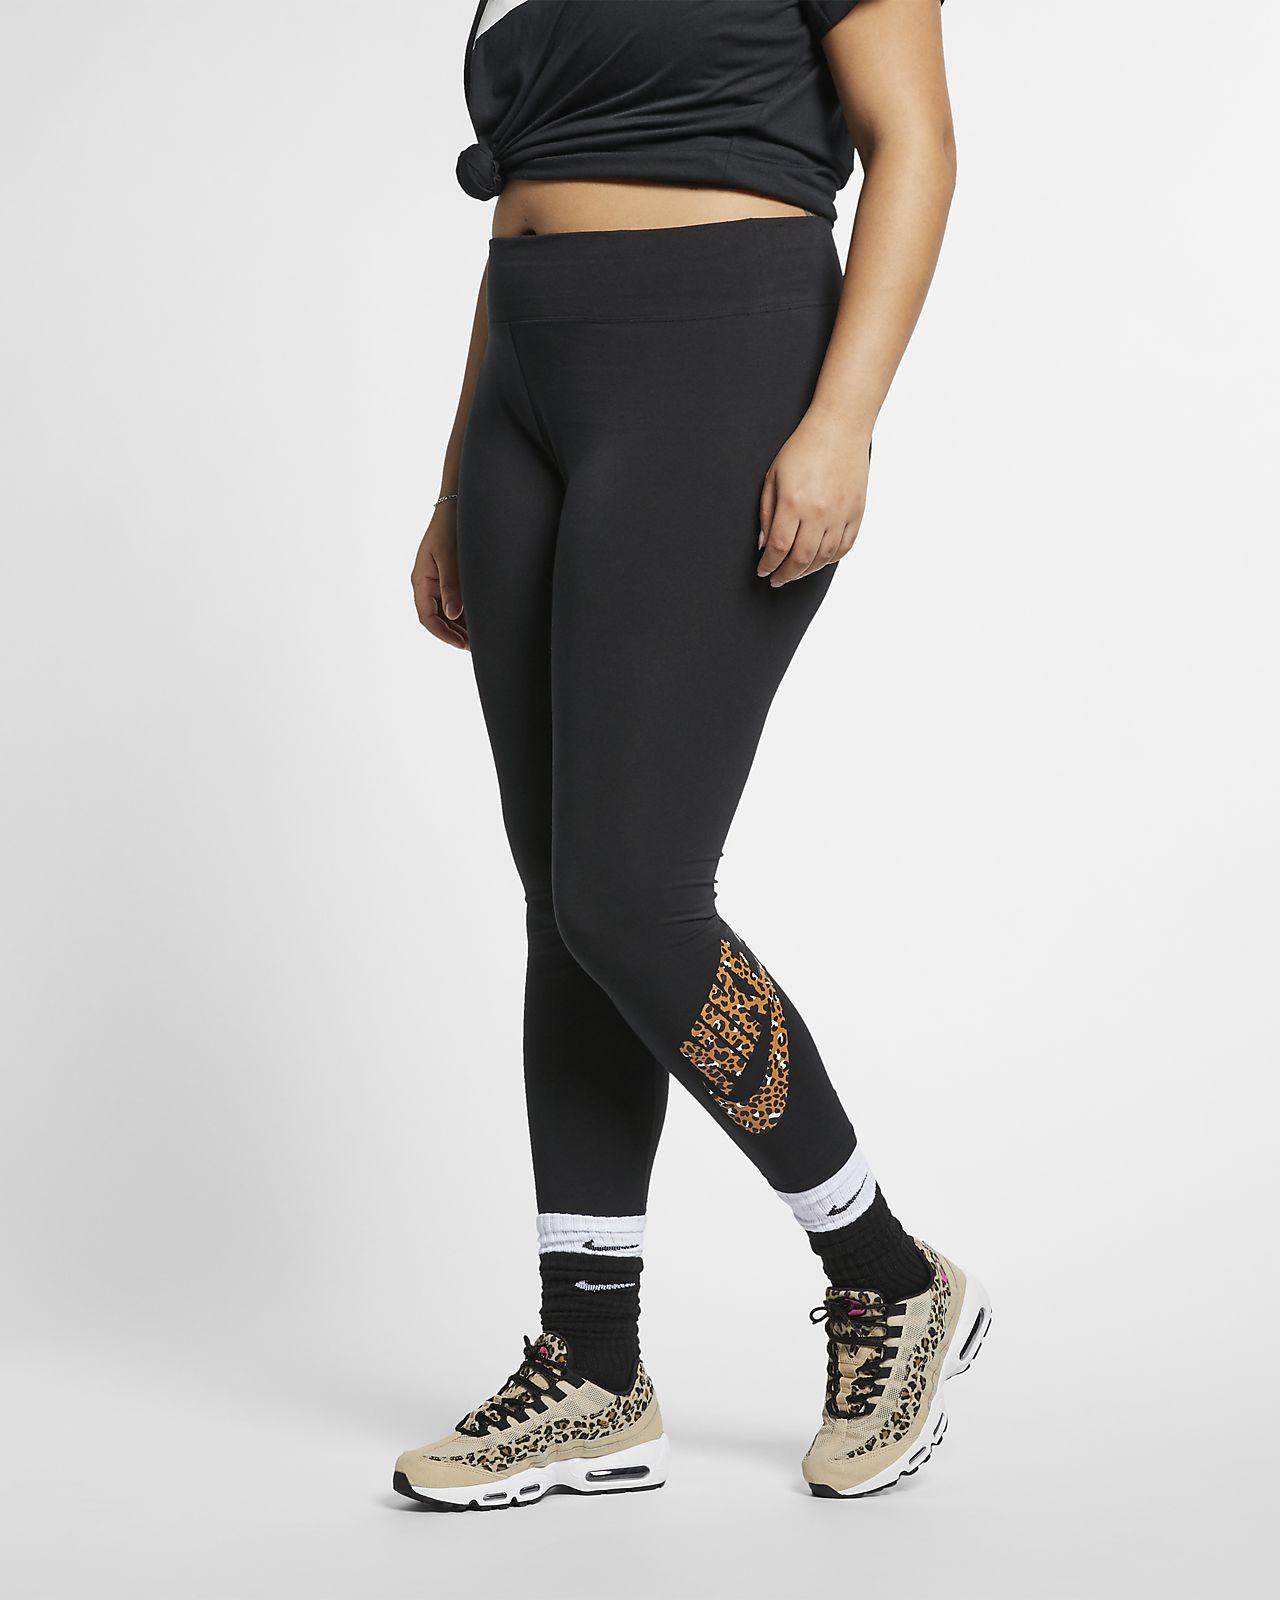 Nike Sportswear Animal Print Women's Leggings (Plus Size)